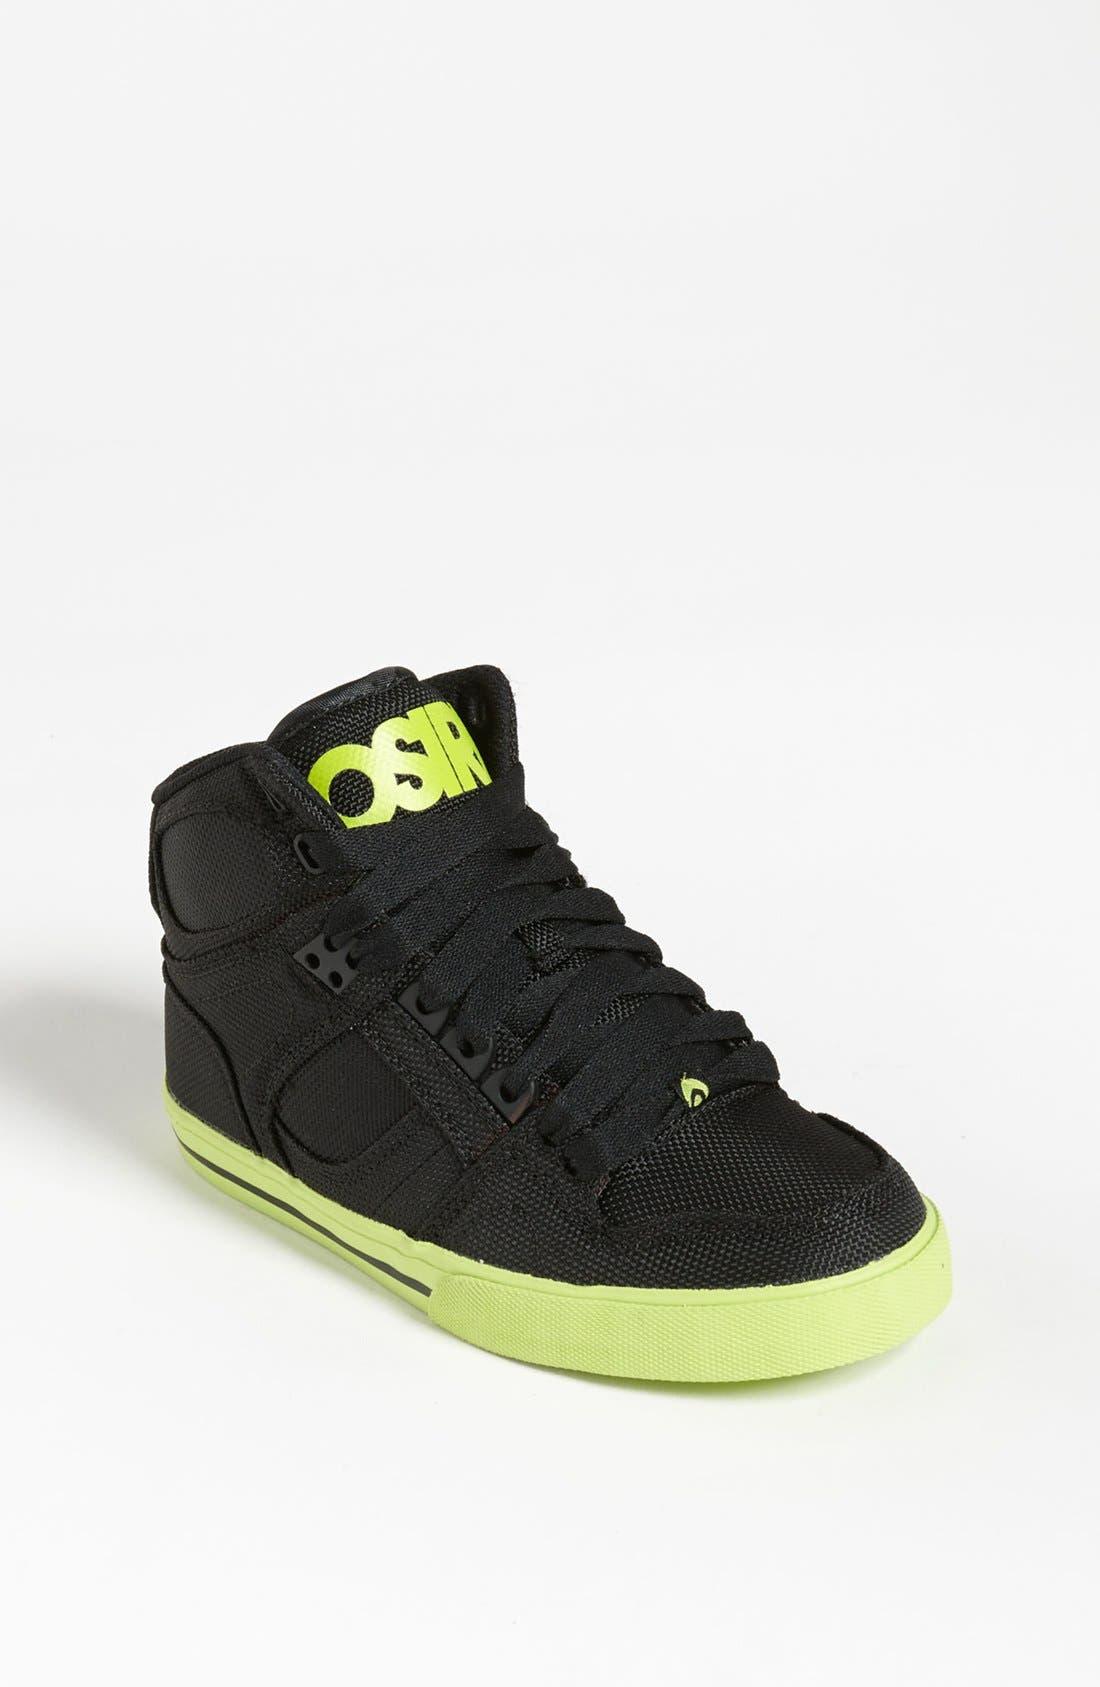 Alternate Image 1 Selected - Osiris 'NYC 83' Sneaker (Toddler, Little Kid & Big Kid)